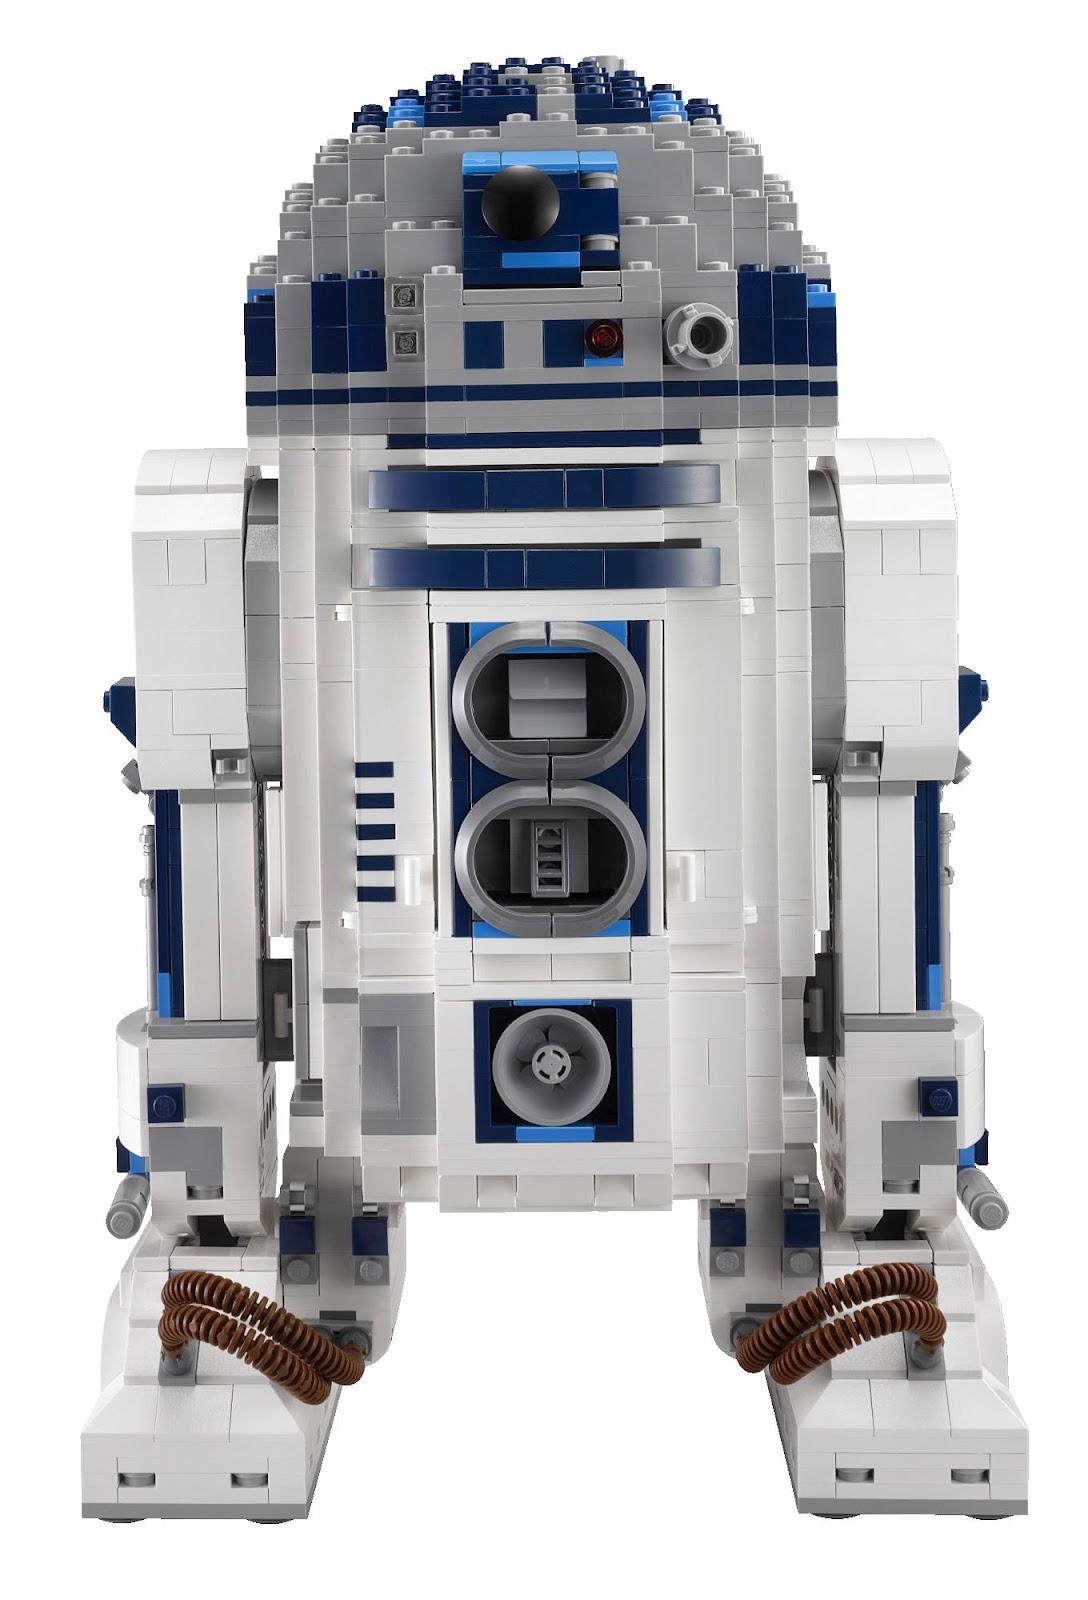 Repubblick set database lego 10225 r2 d2 - Lego starwars r2d2 ...